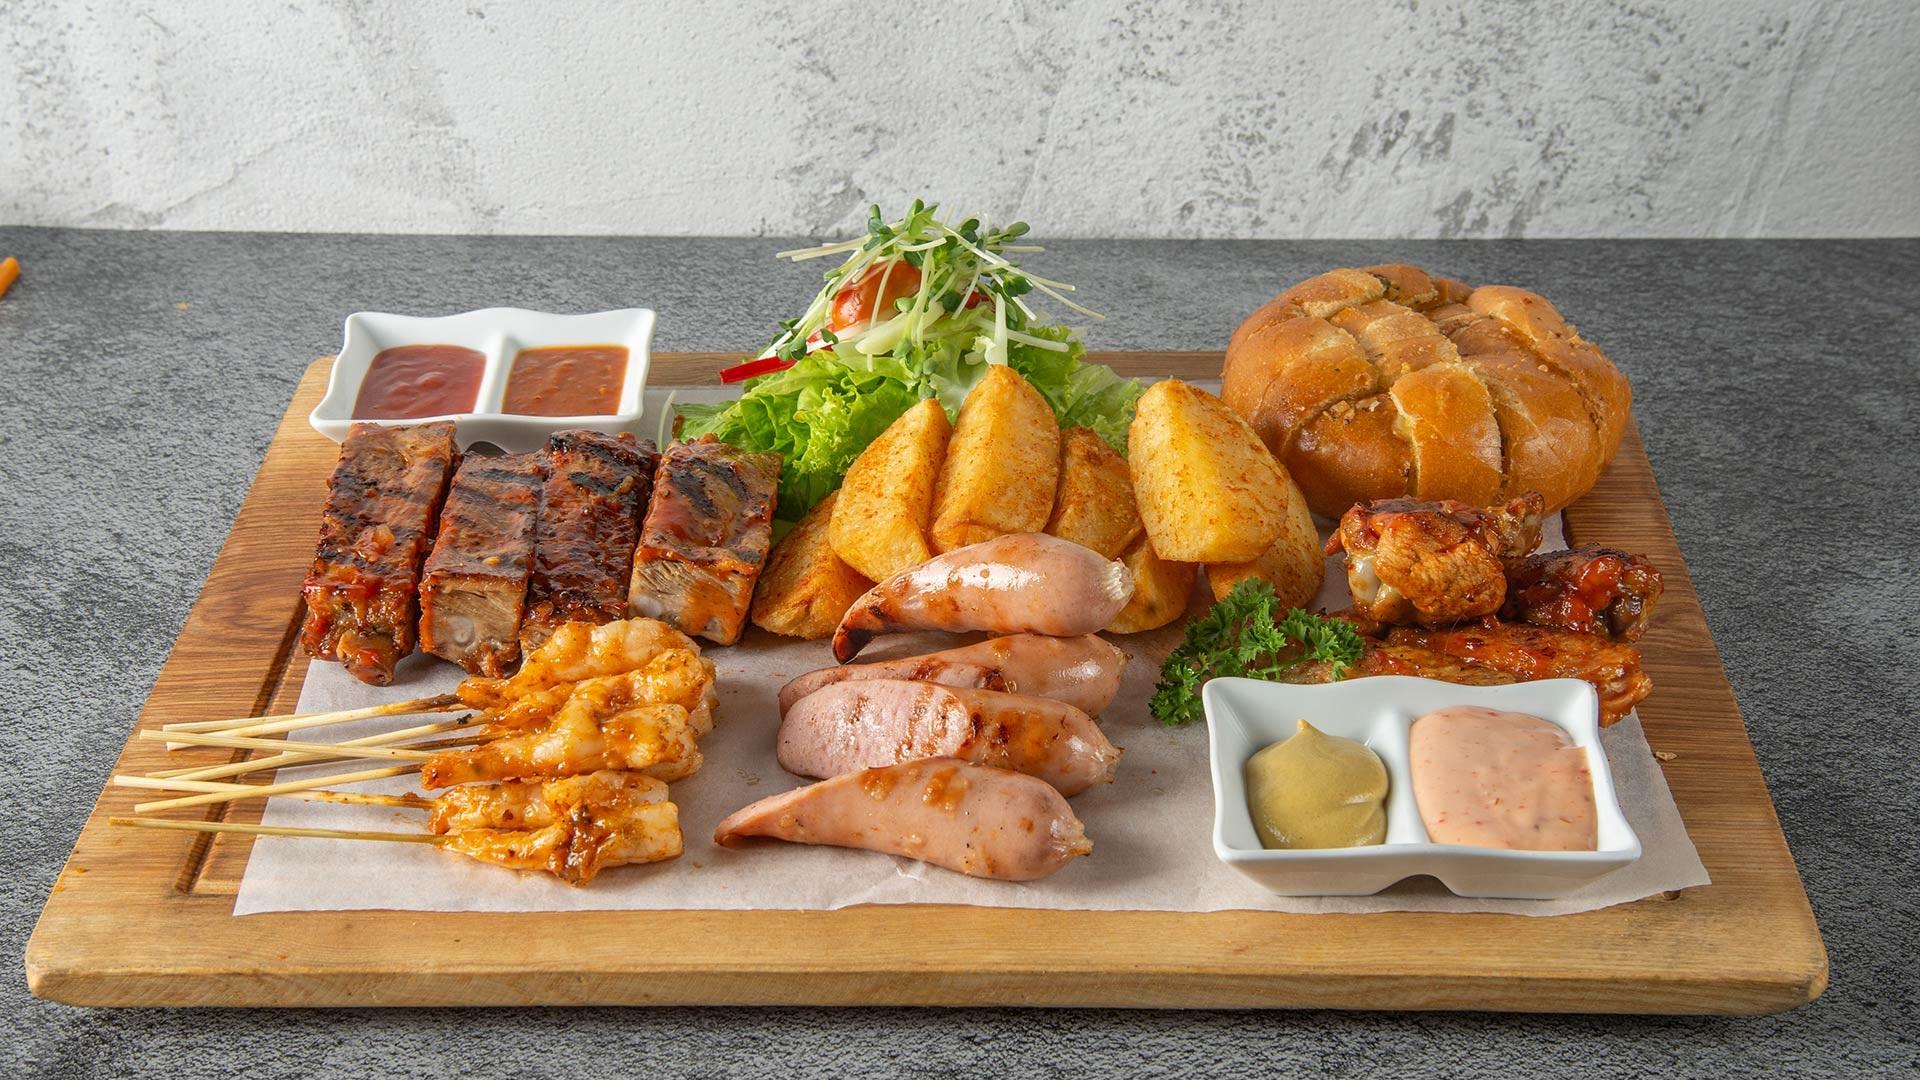 Al Fresco's - Top 20 best restaurants you must give a try in Hanoi